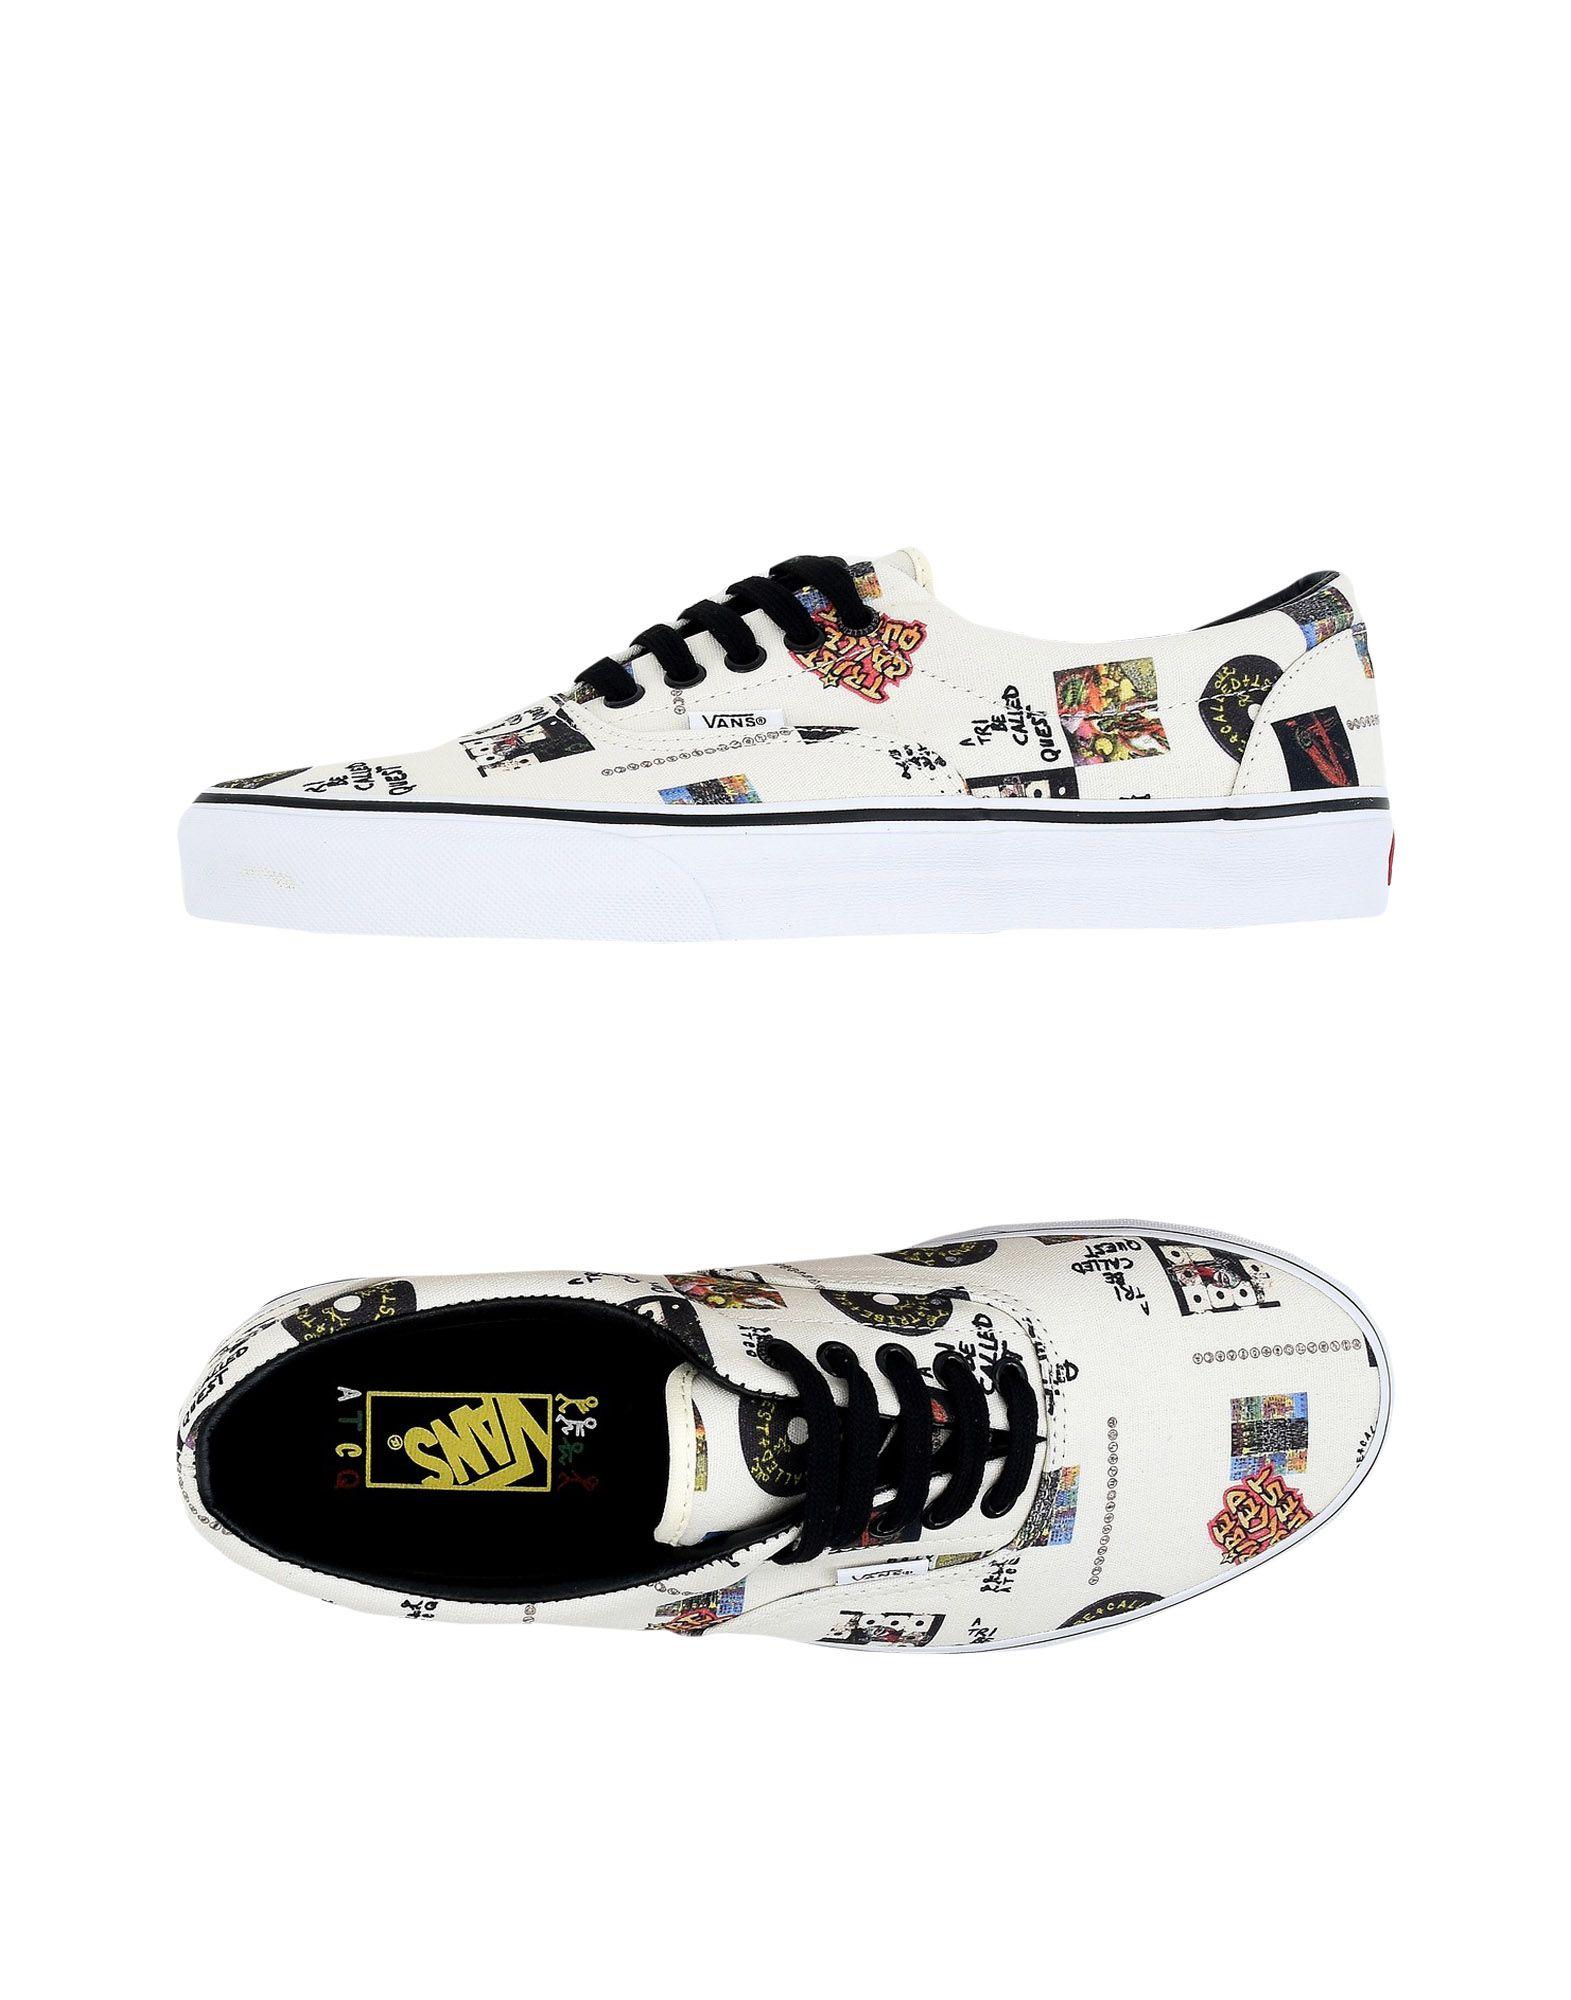 Vans - Ua Era - Sneakers - Vans Men Vans Sneakers online on  Canada - 11480831FS 8efb12